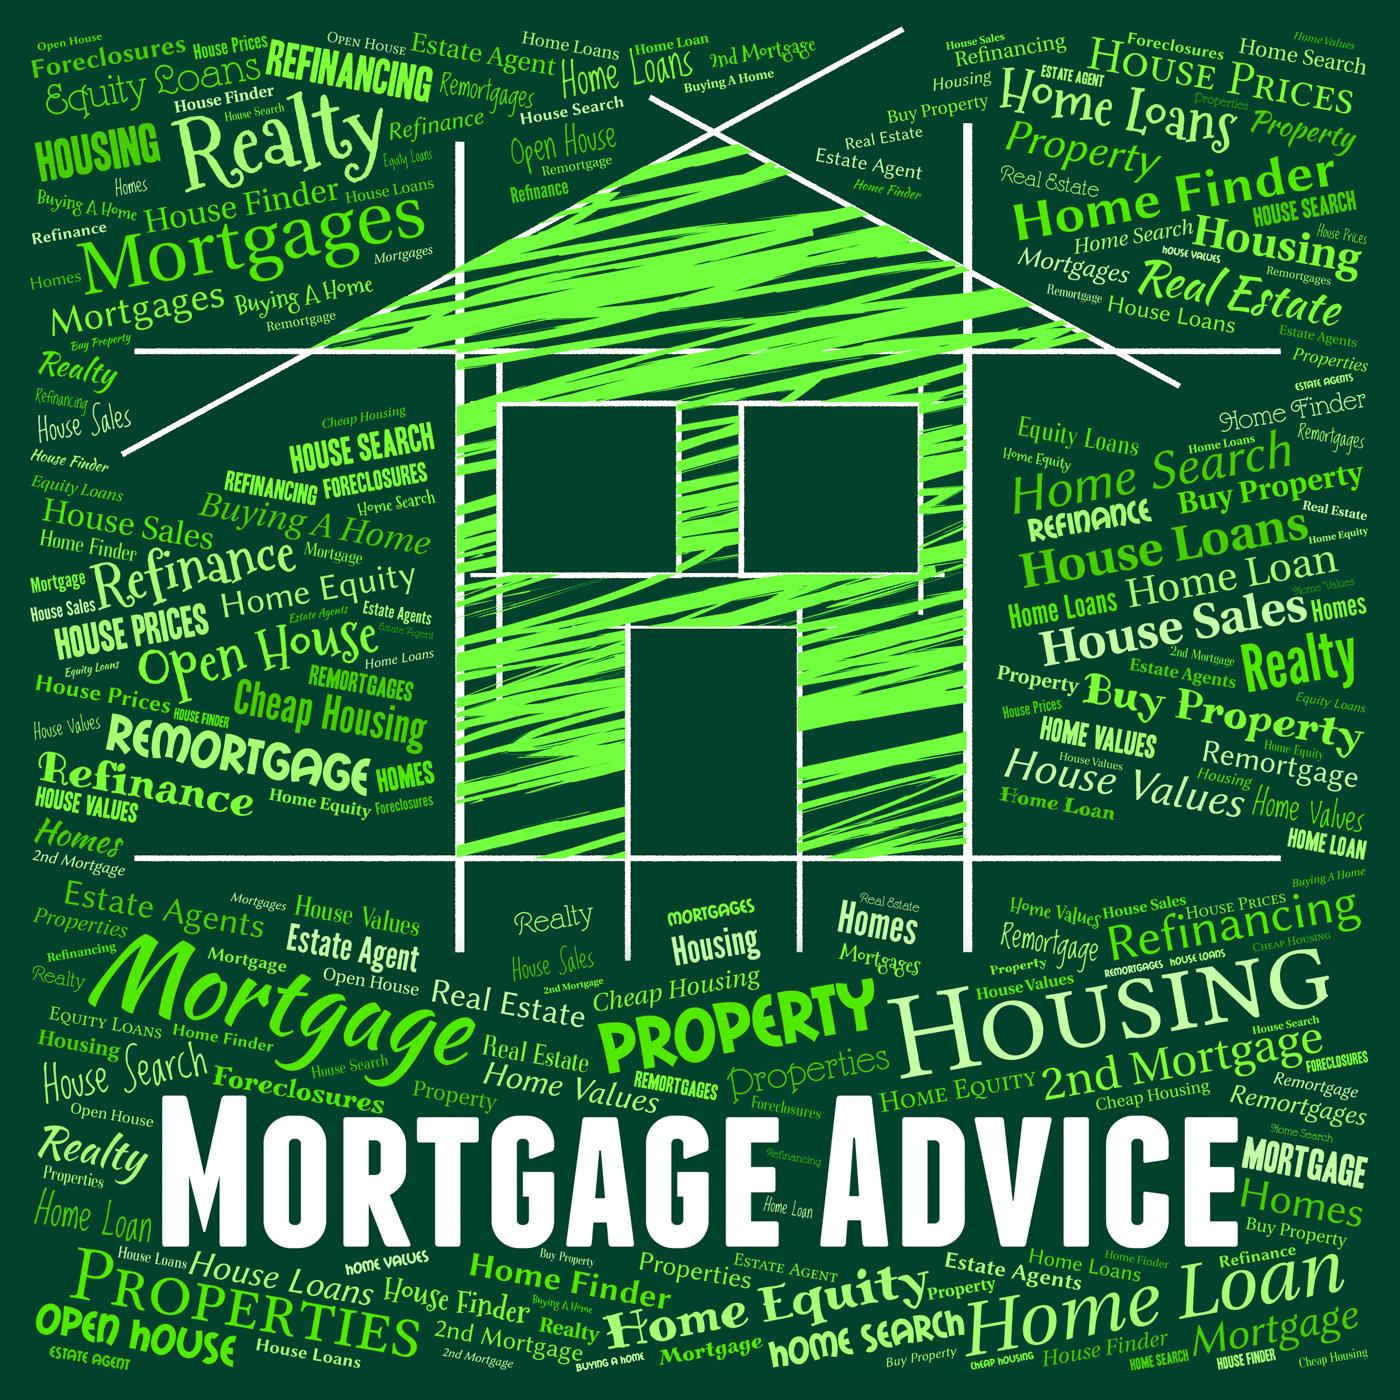 Mortgage Advice Indicates Home Loan And Advise, Mortgage, Mortgages, Loans, Loan, HQ Photo